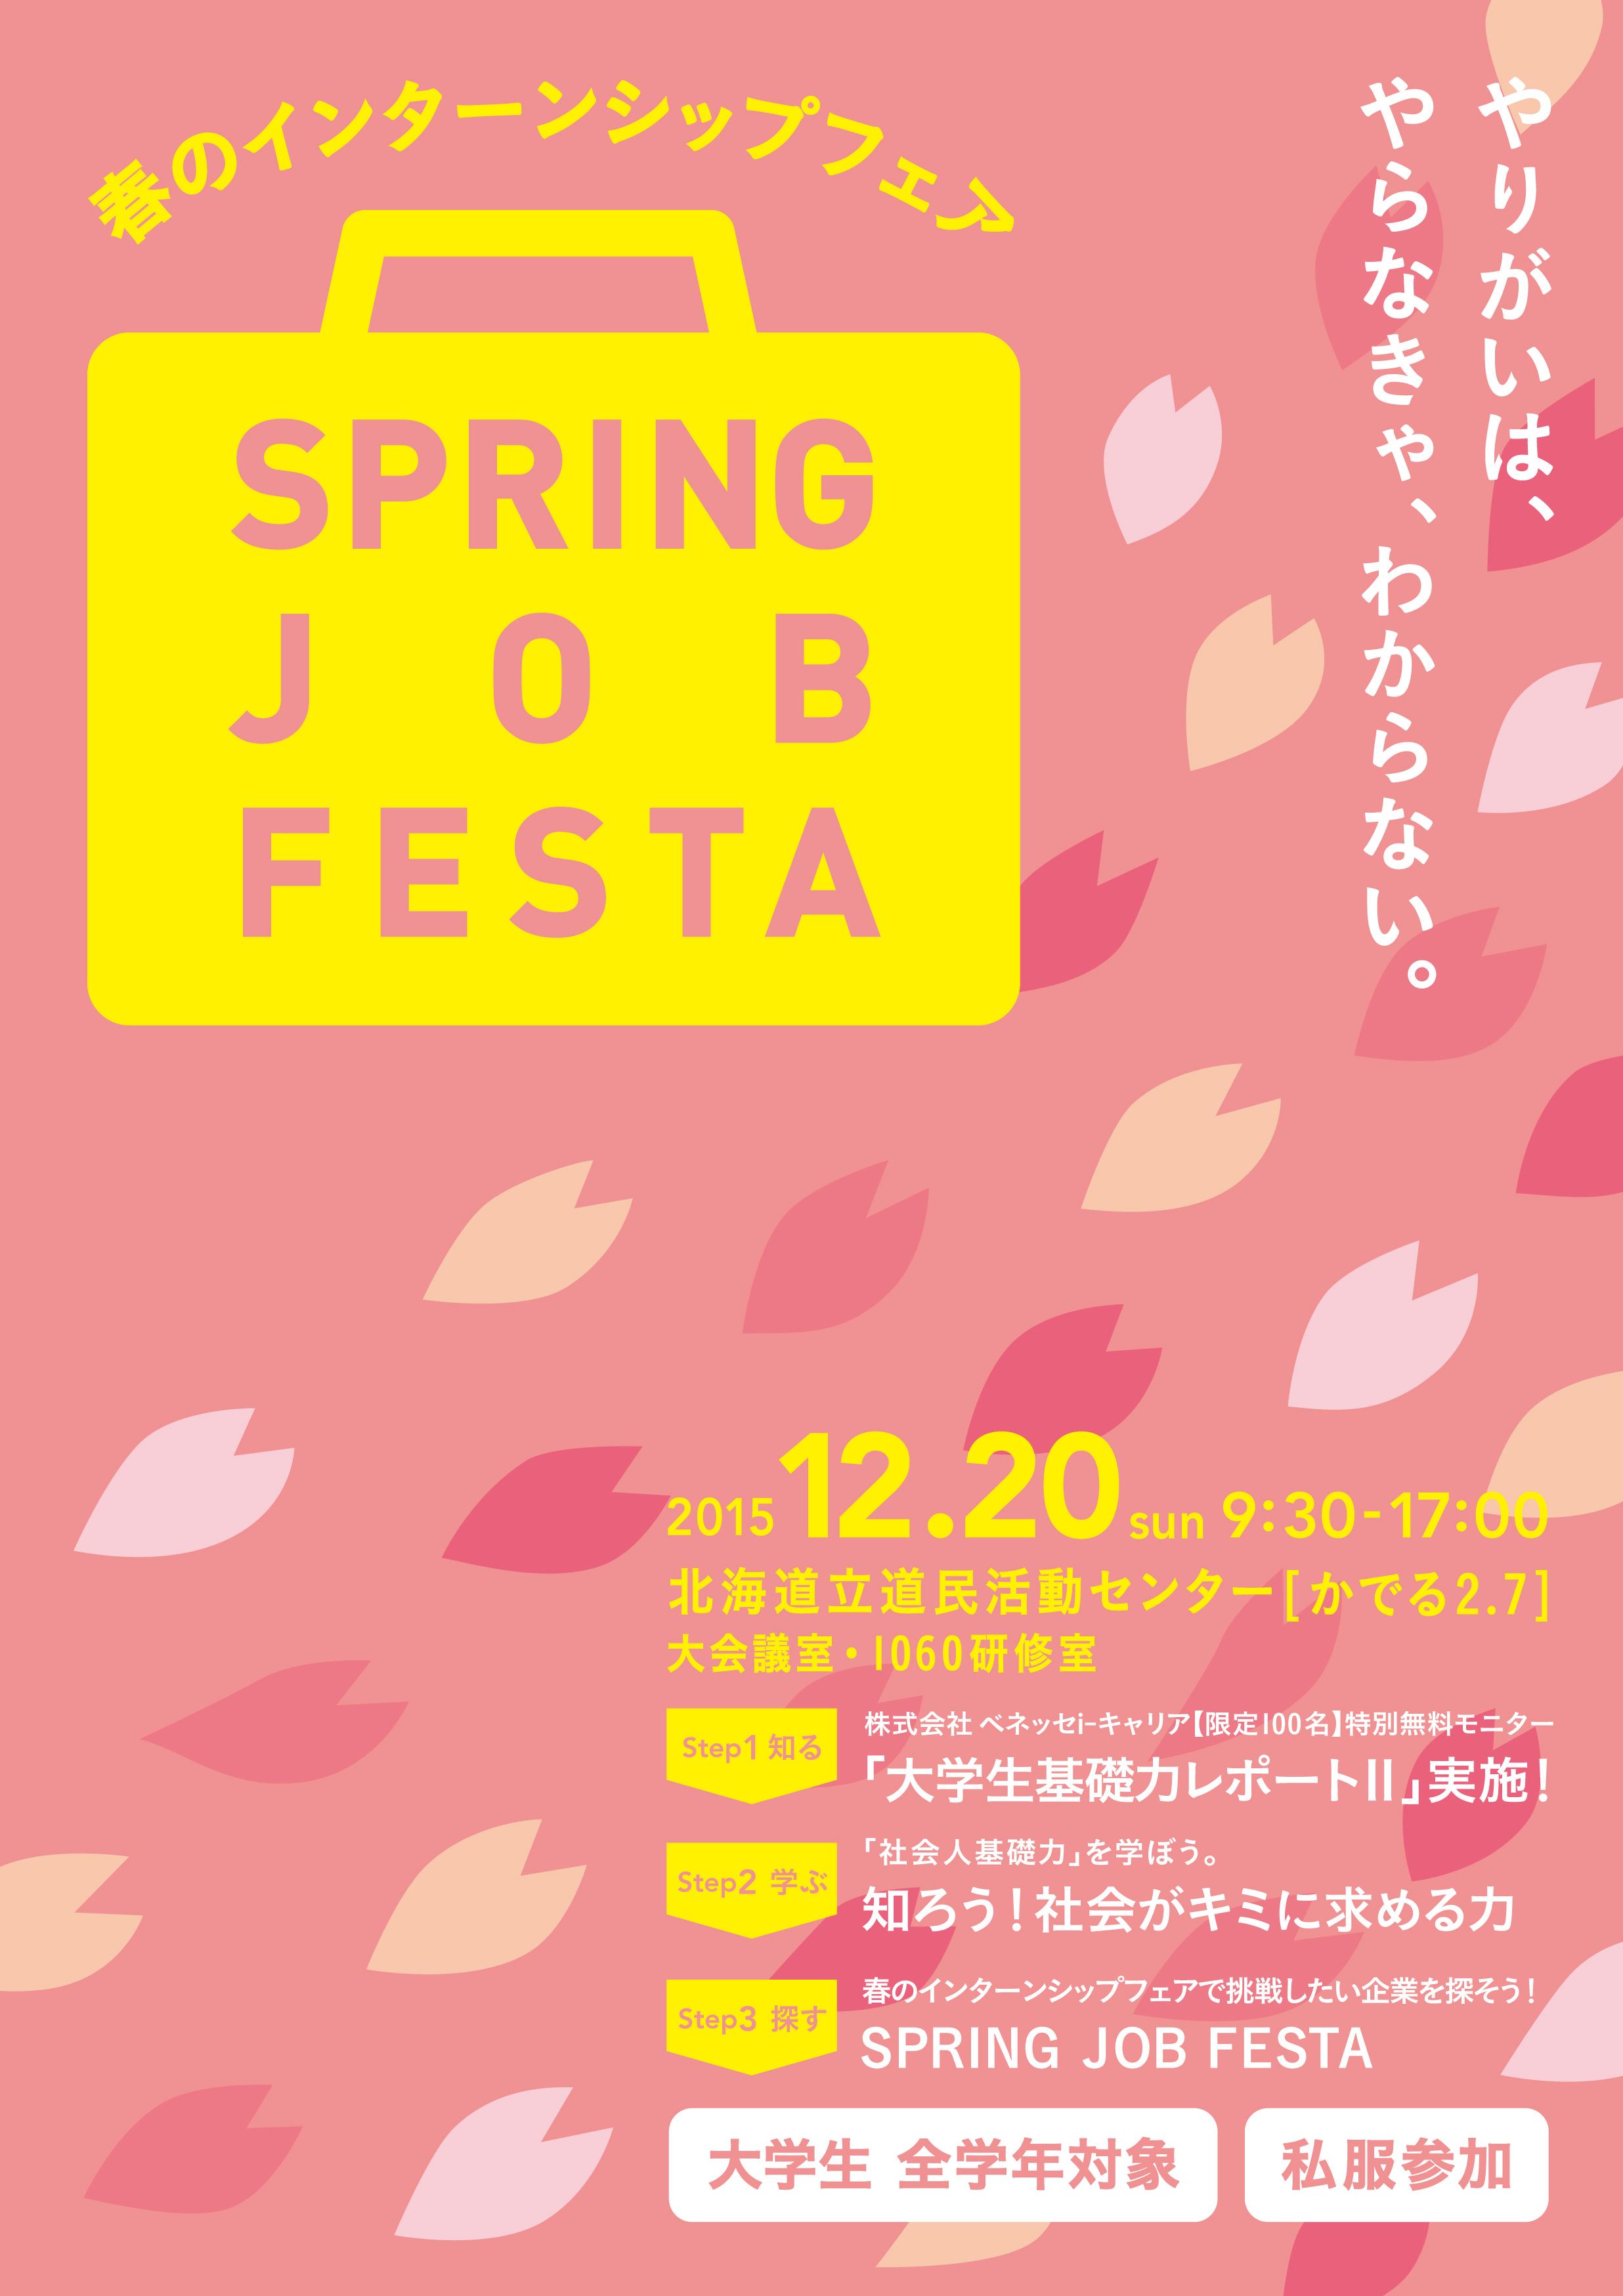 spring_job_festa_flyer_omote-01